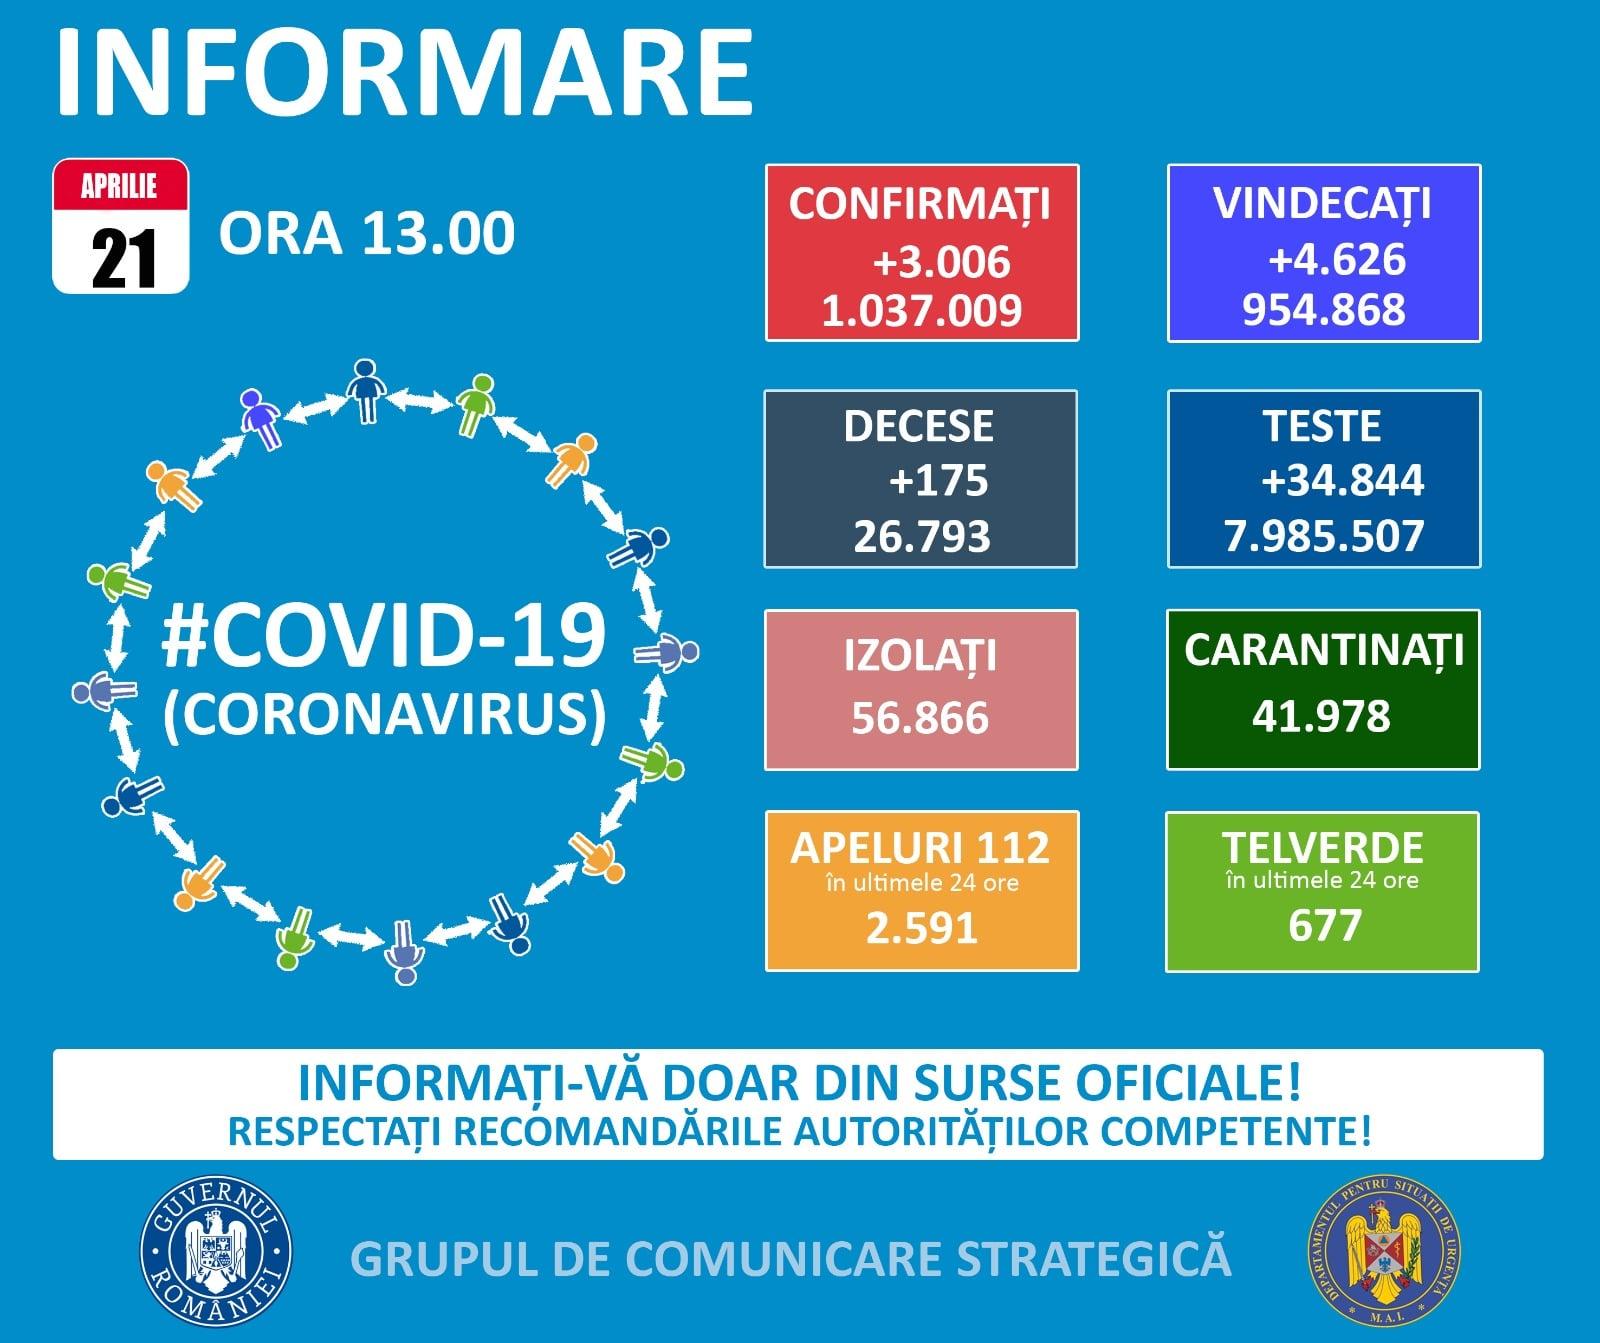 Informare COVID-19, 21 aprilie 2021